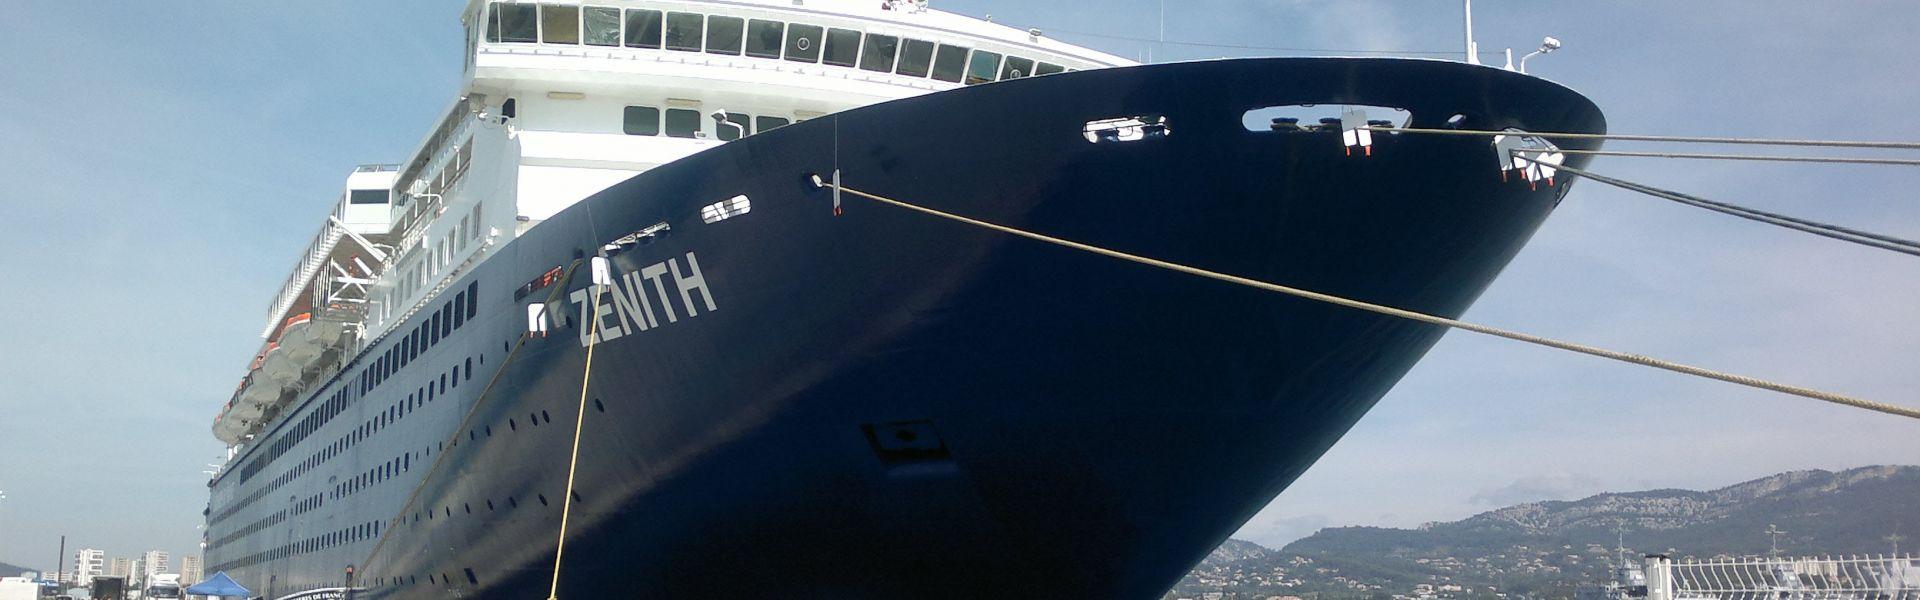 Croaziera 2017 - Caraibele de Est ( Santo Domingo) - Pullmantur Cruises - Zenith -  7 nopti